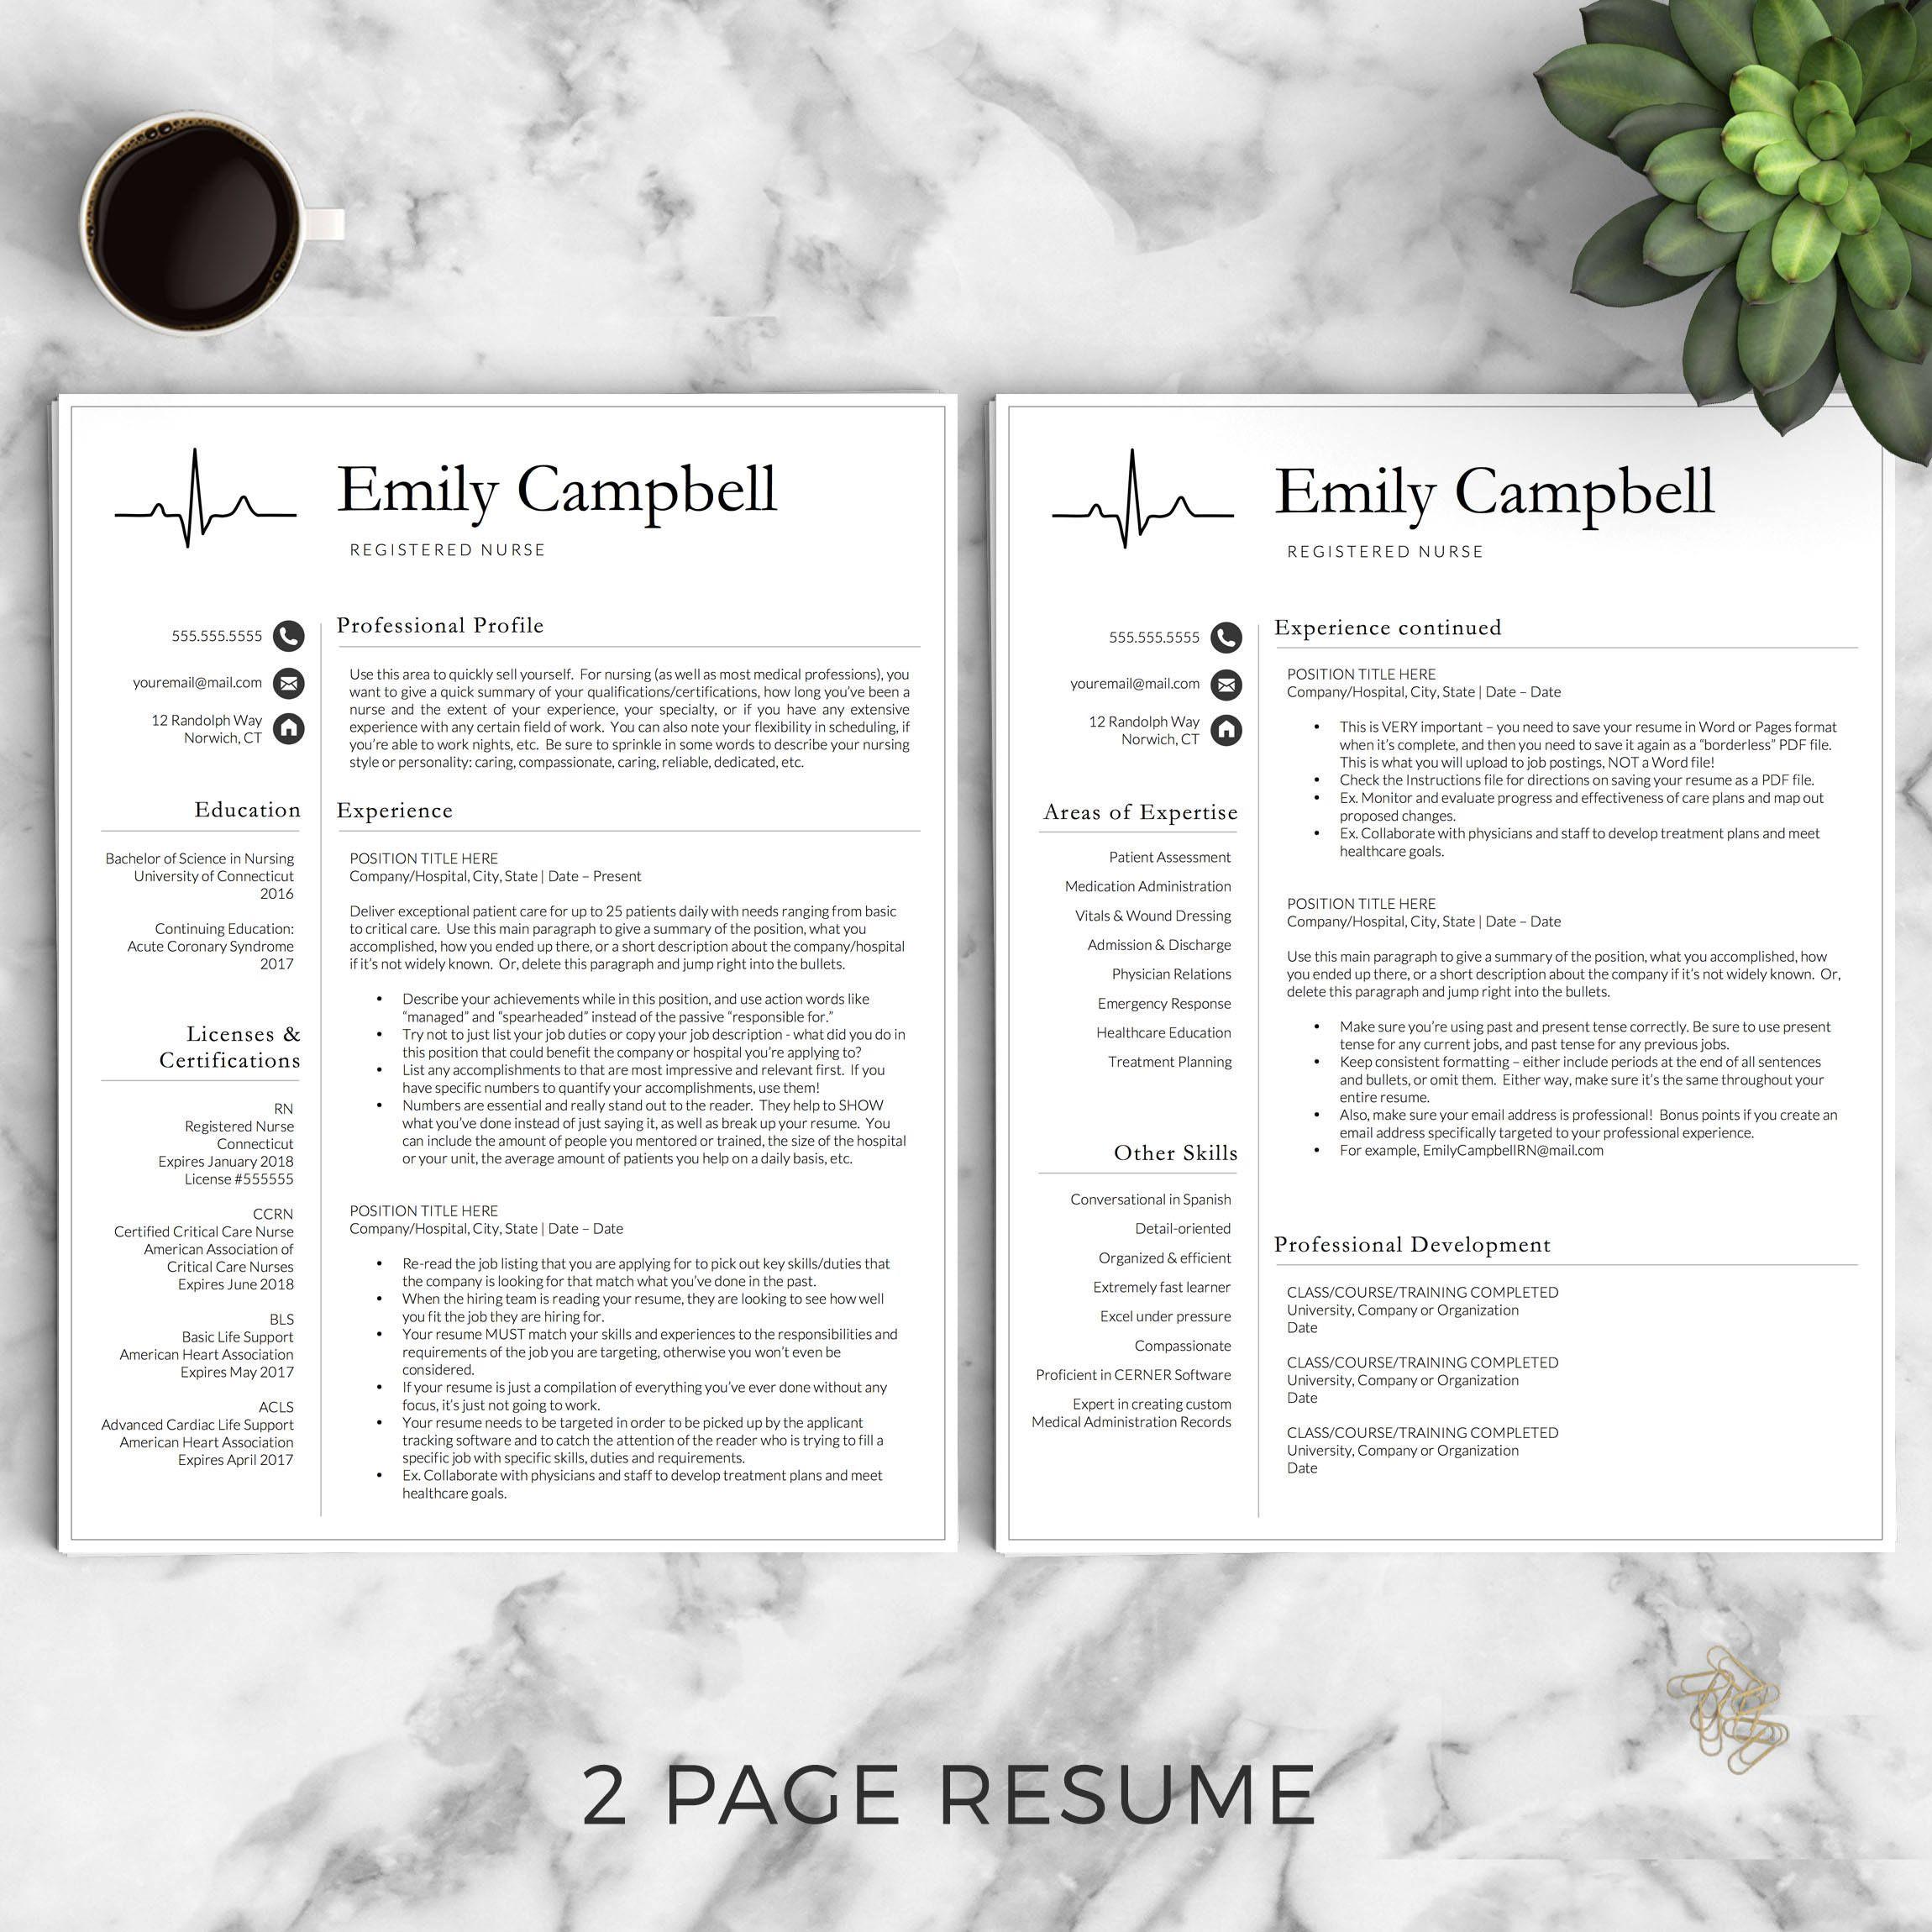 Nursing Resume Template / CV For Nursing Student, Nurse